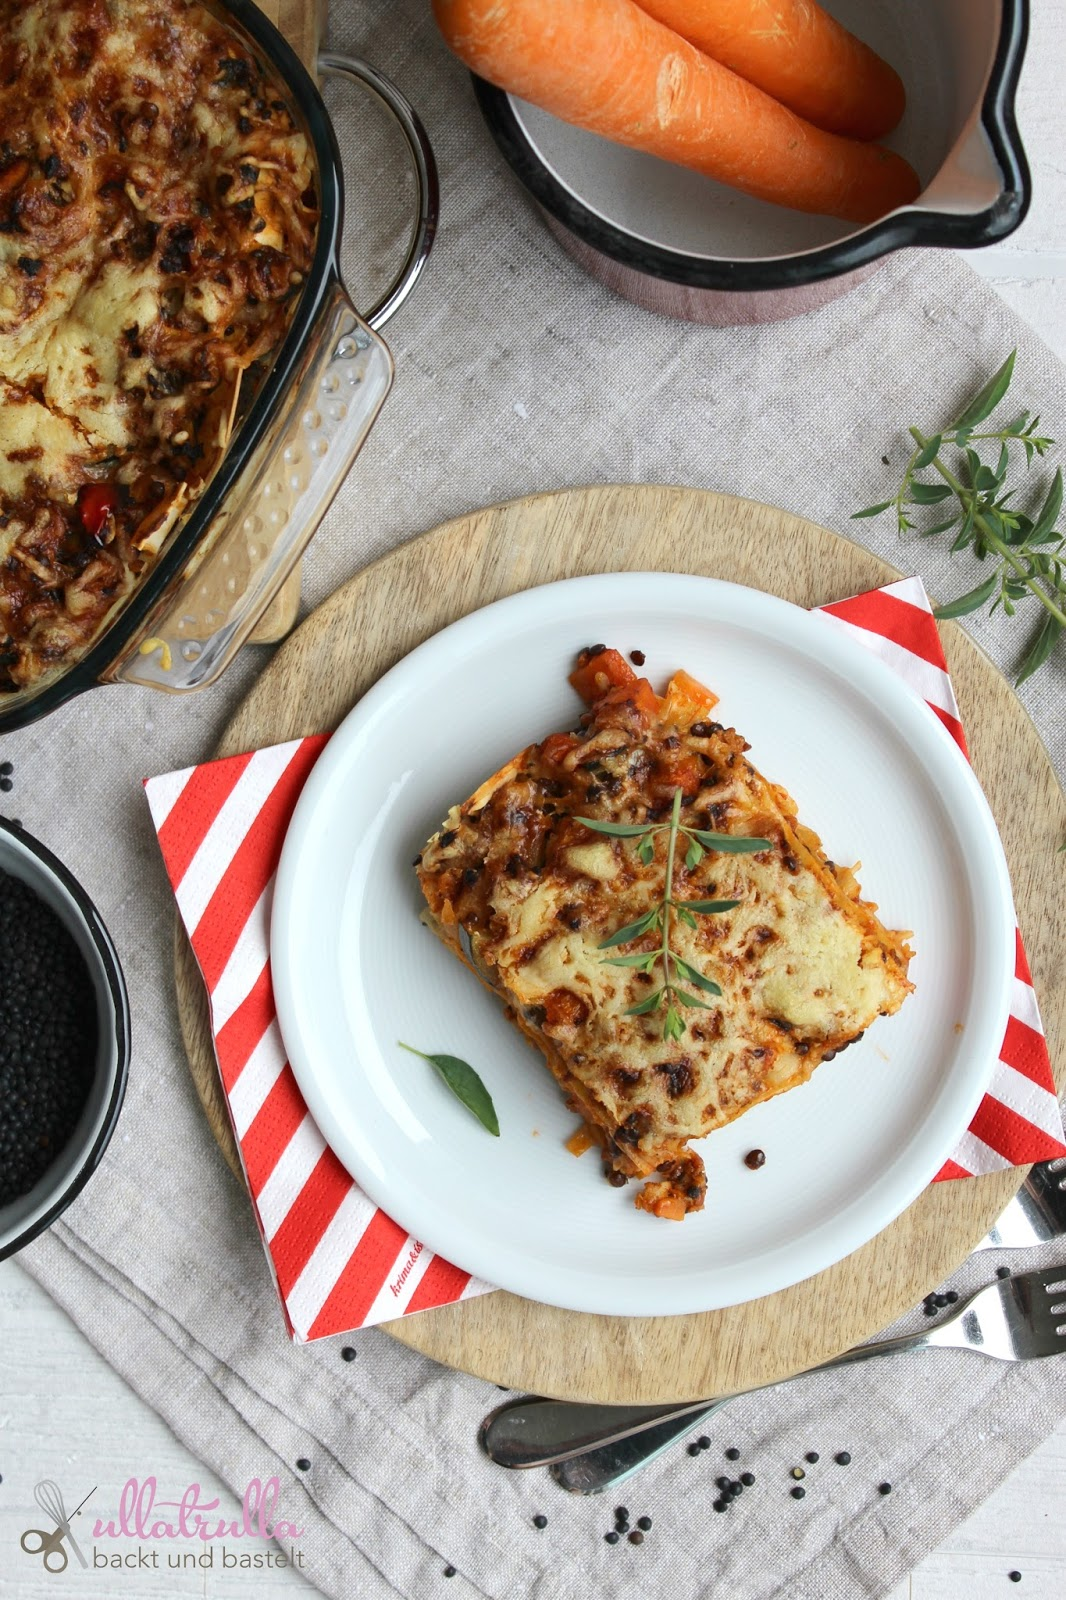 ullatrulla backt und bastelt lasagne mit linsen und gem se der klassiker einmal anders. Black Bedroom Furniture Sets. Home Design Ideas